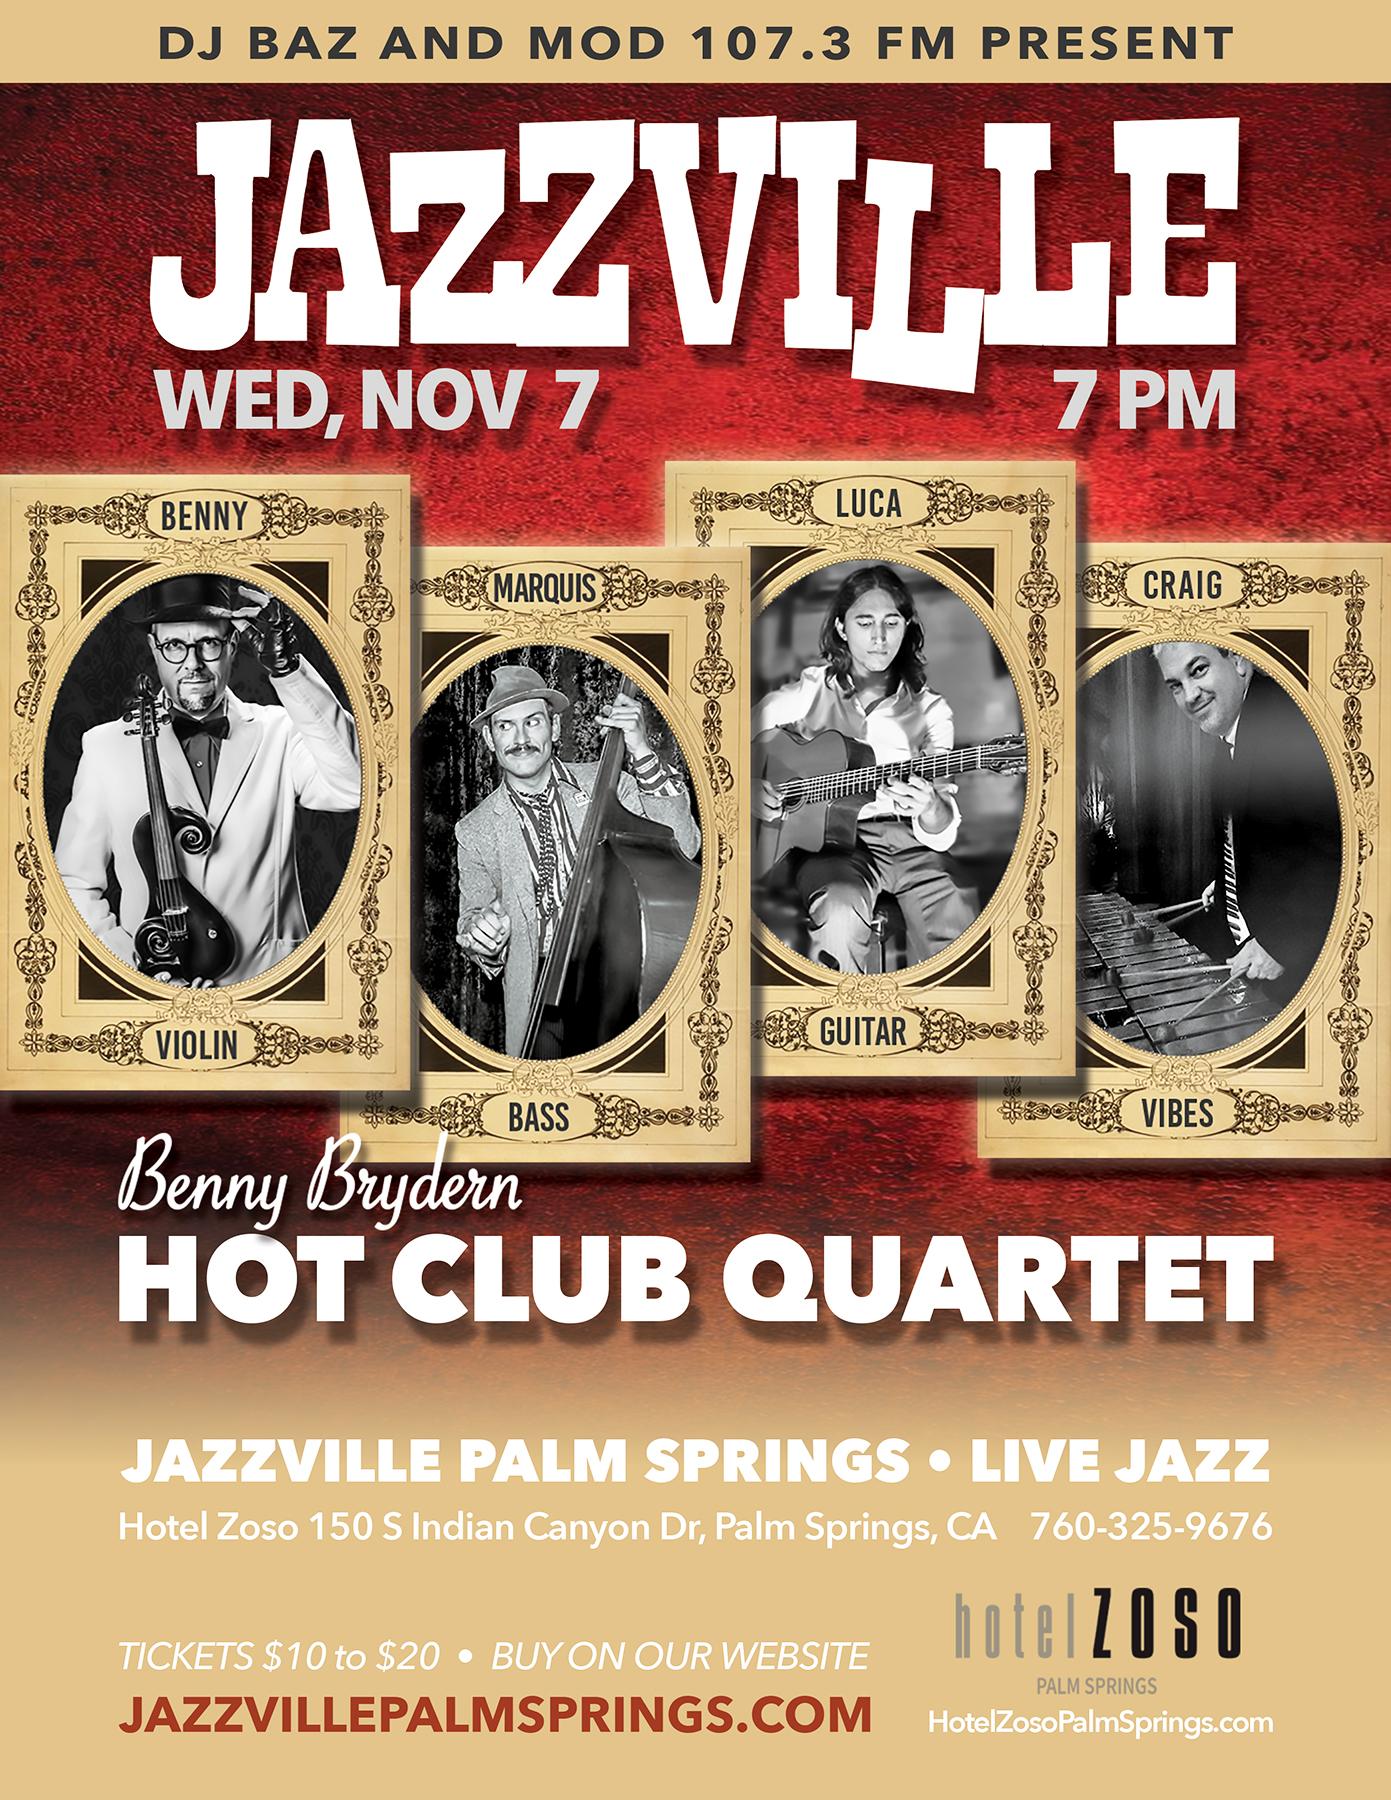 Jazzville Palm Springs - Benny Brydern Hot Club Quartet